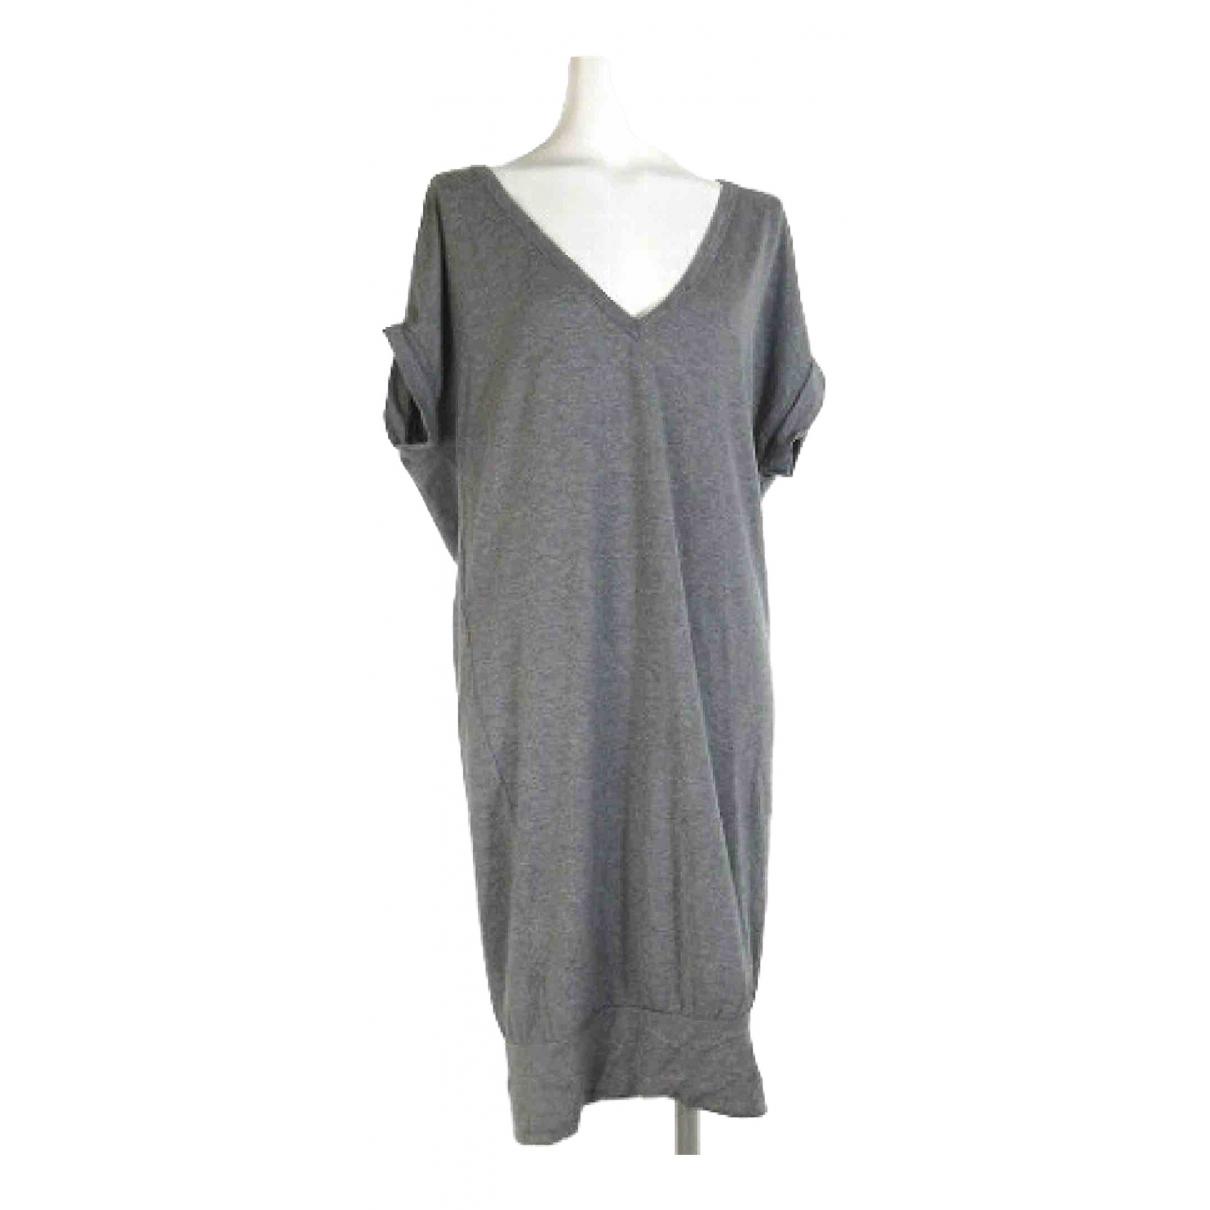 Junya Watanabe N Grey Cotton dress for Women S International